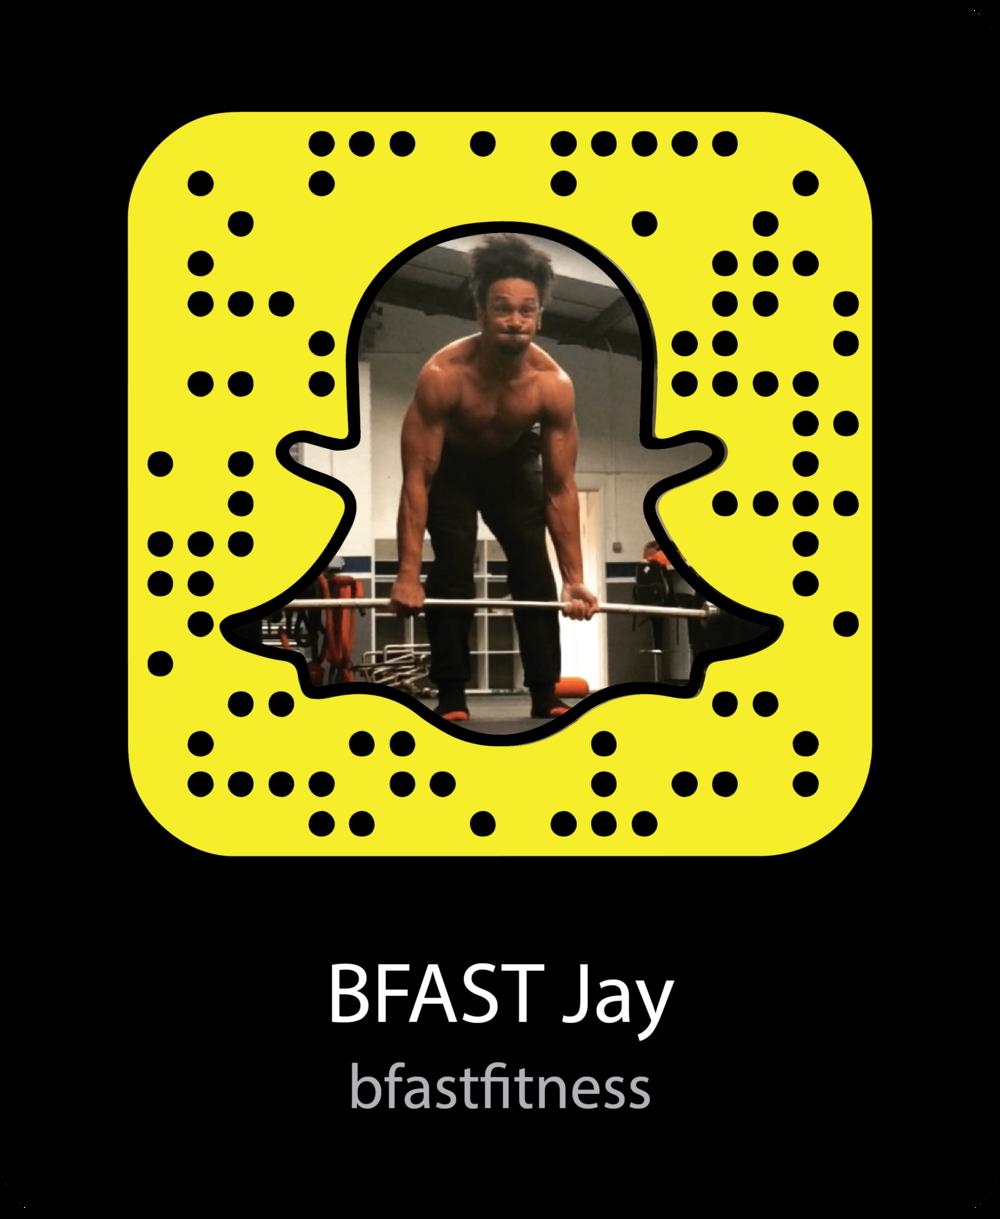 bfast-jay-fitness-snapchat-snapcode